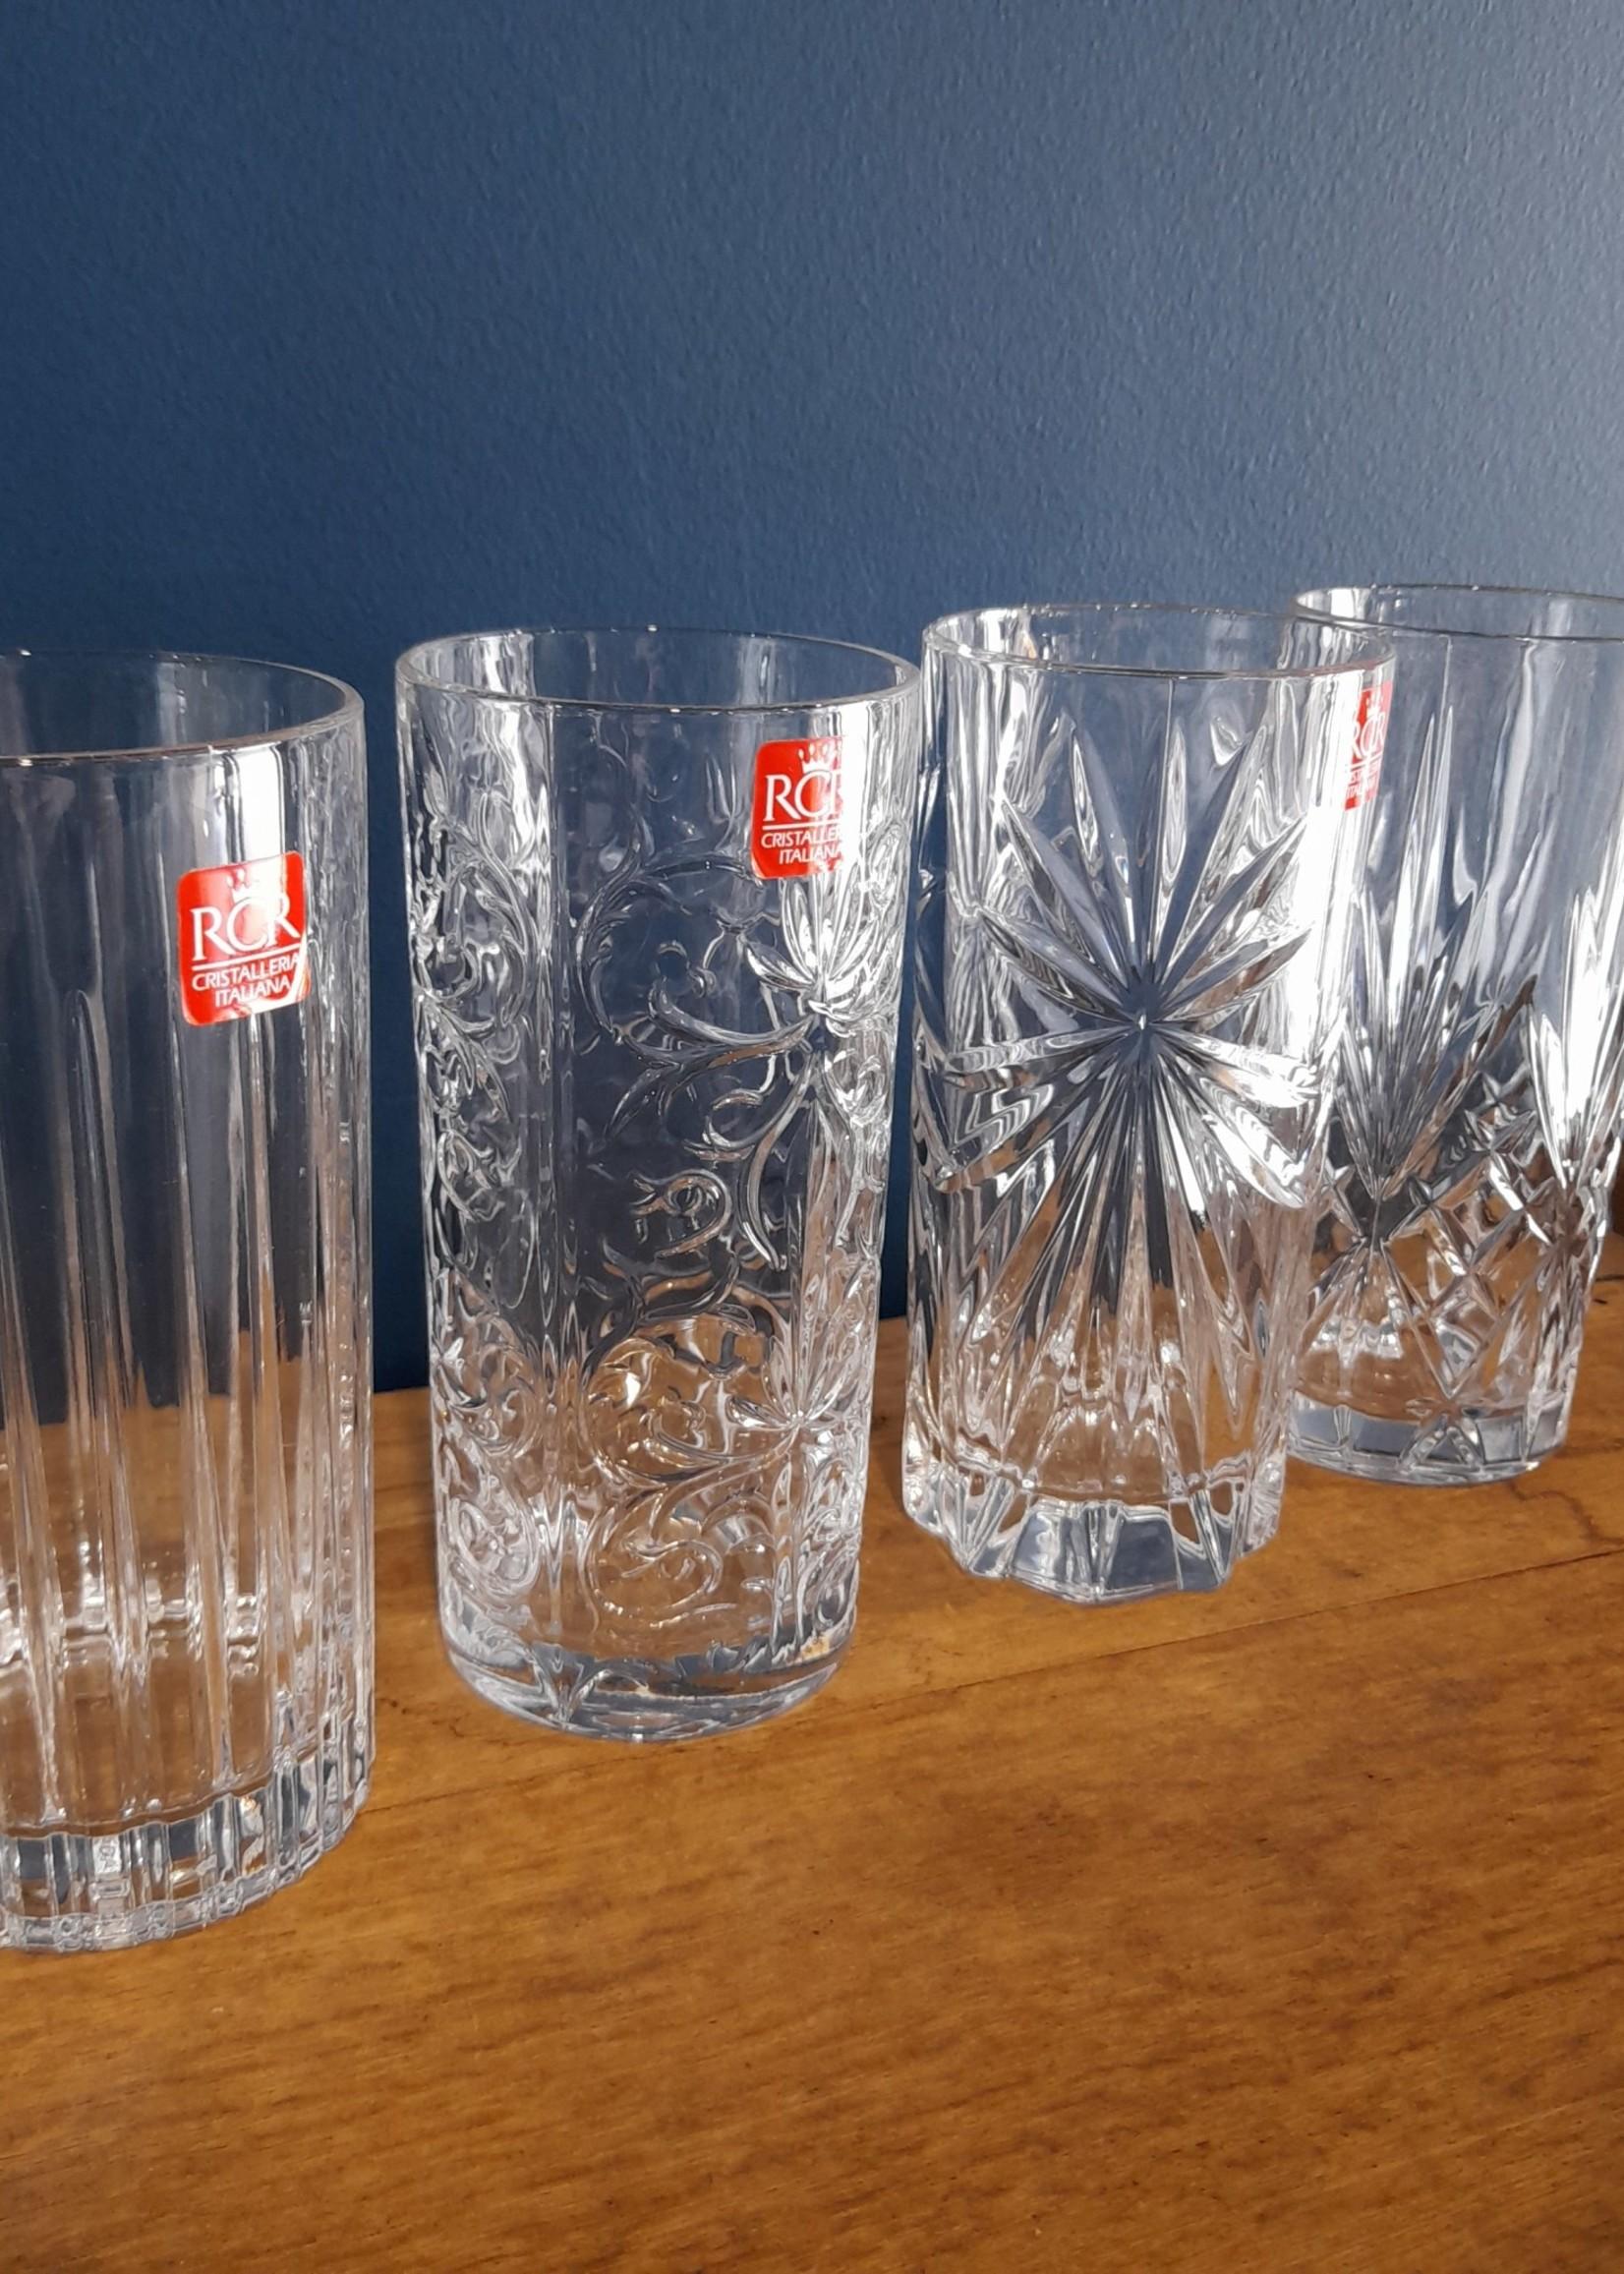 RCR RCR Mixology Tall Glass set (4)